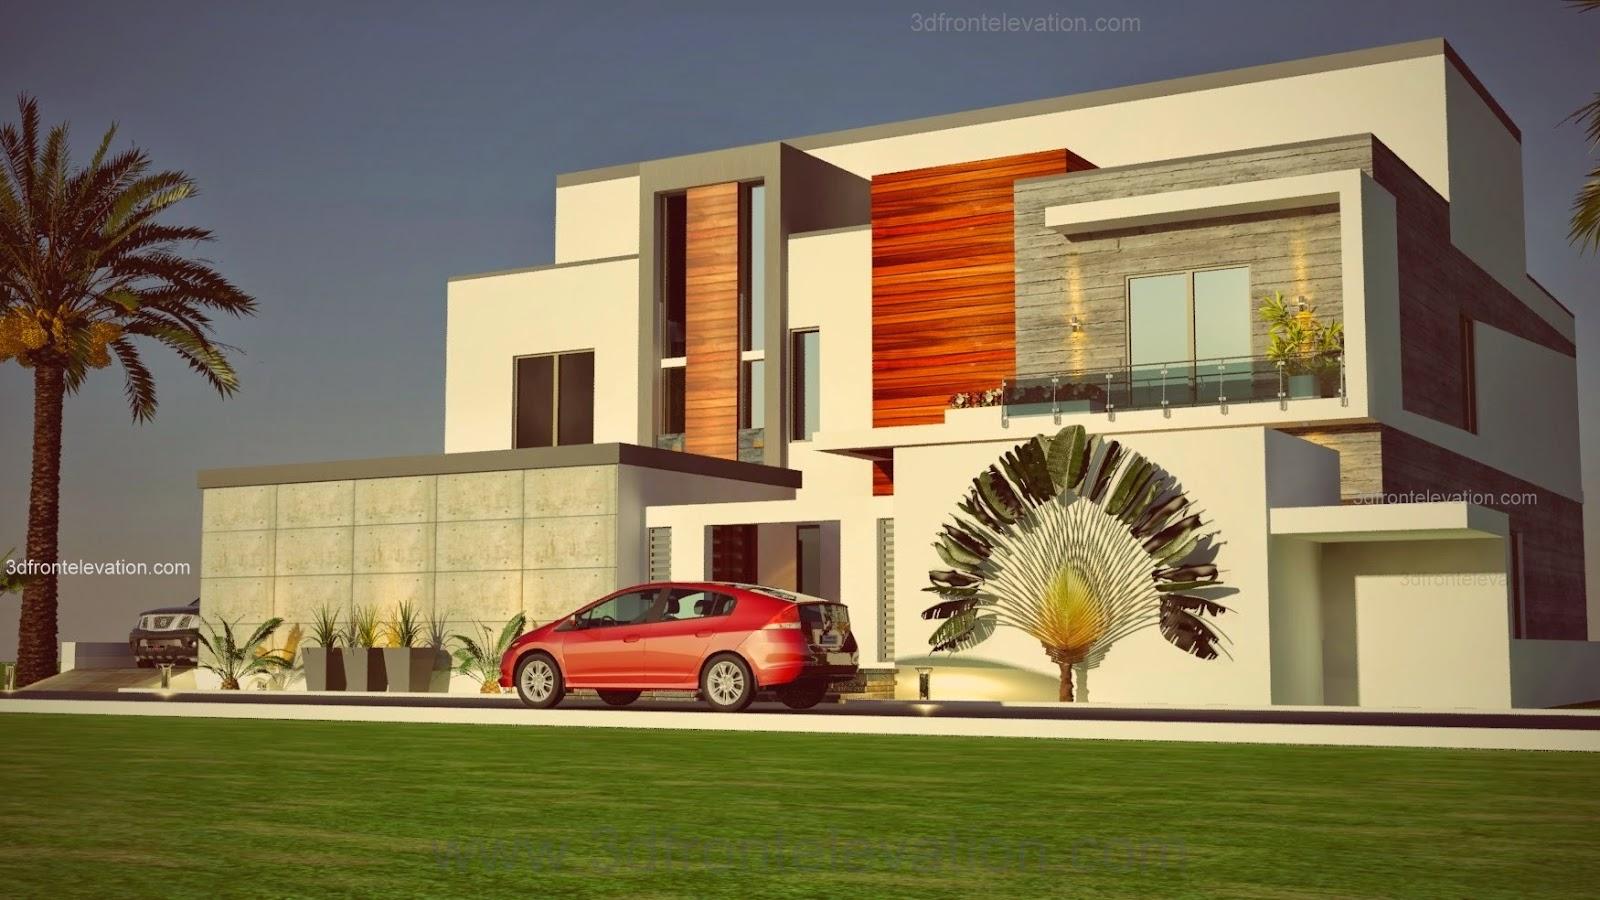 Dubai Modern Houses Zion Star